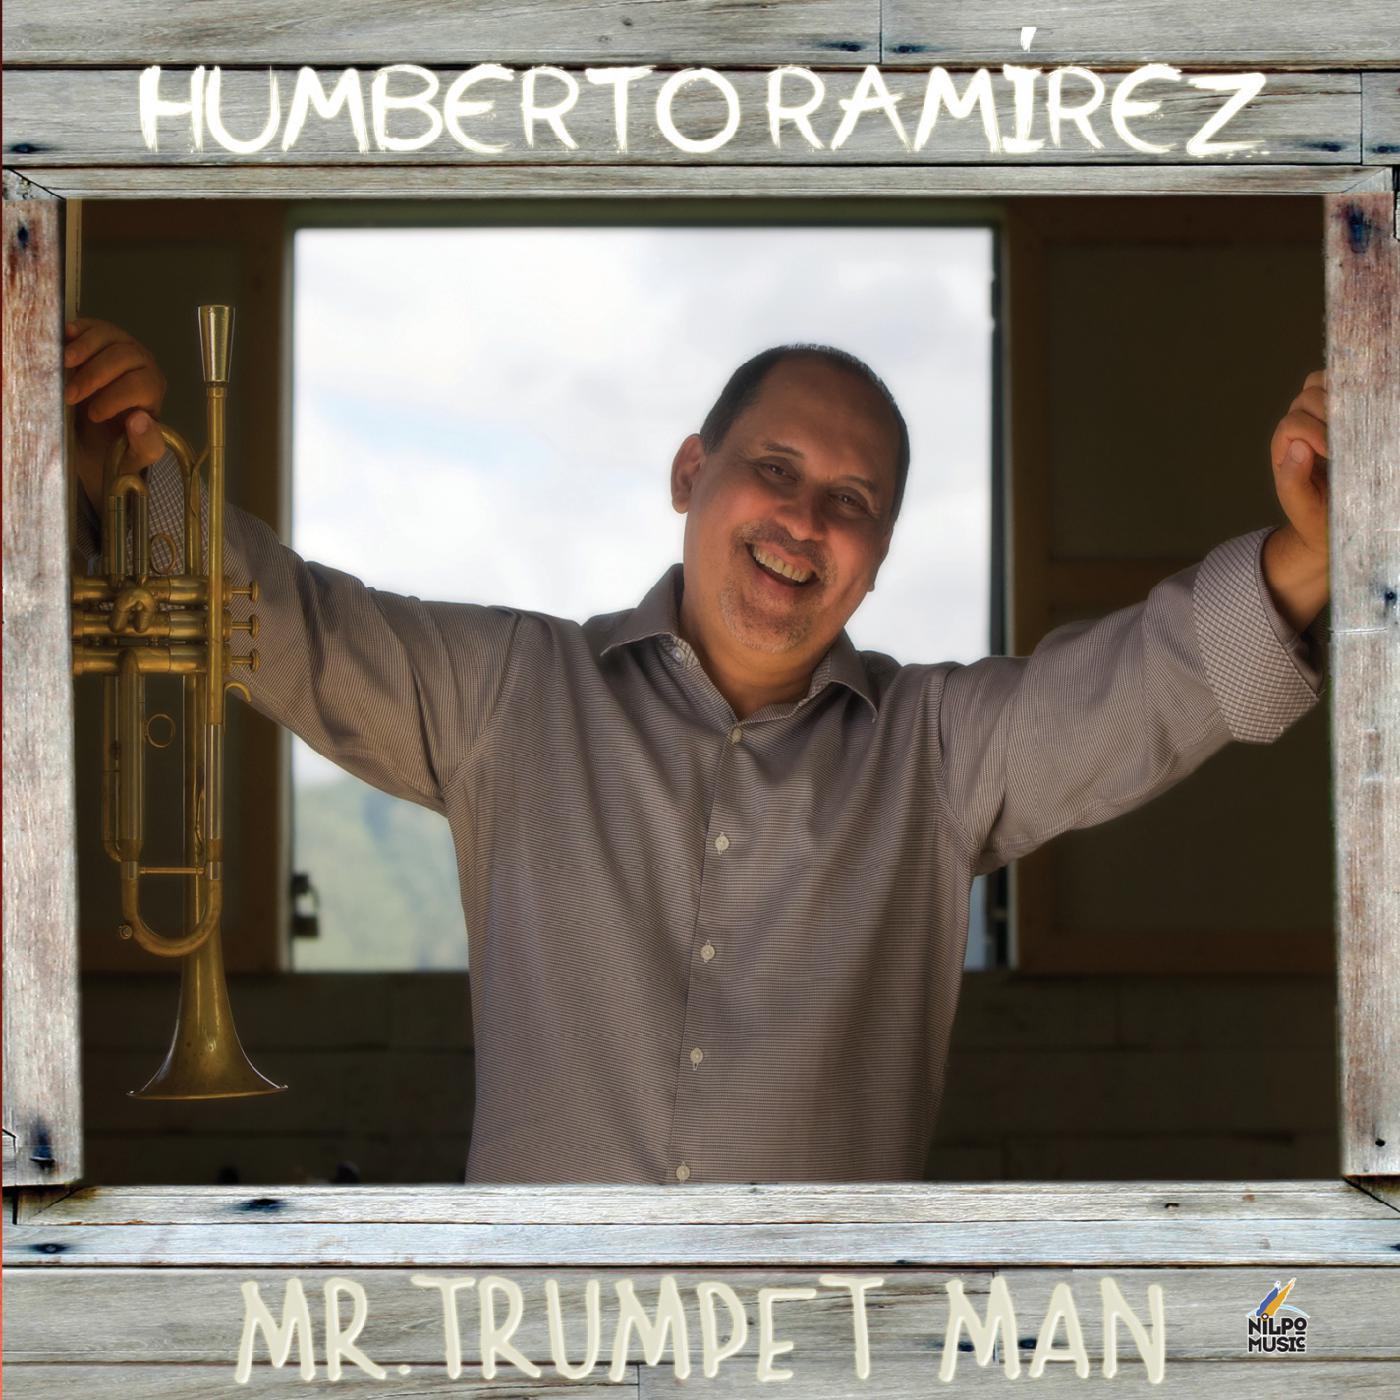 Mr. Trumpet Man